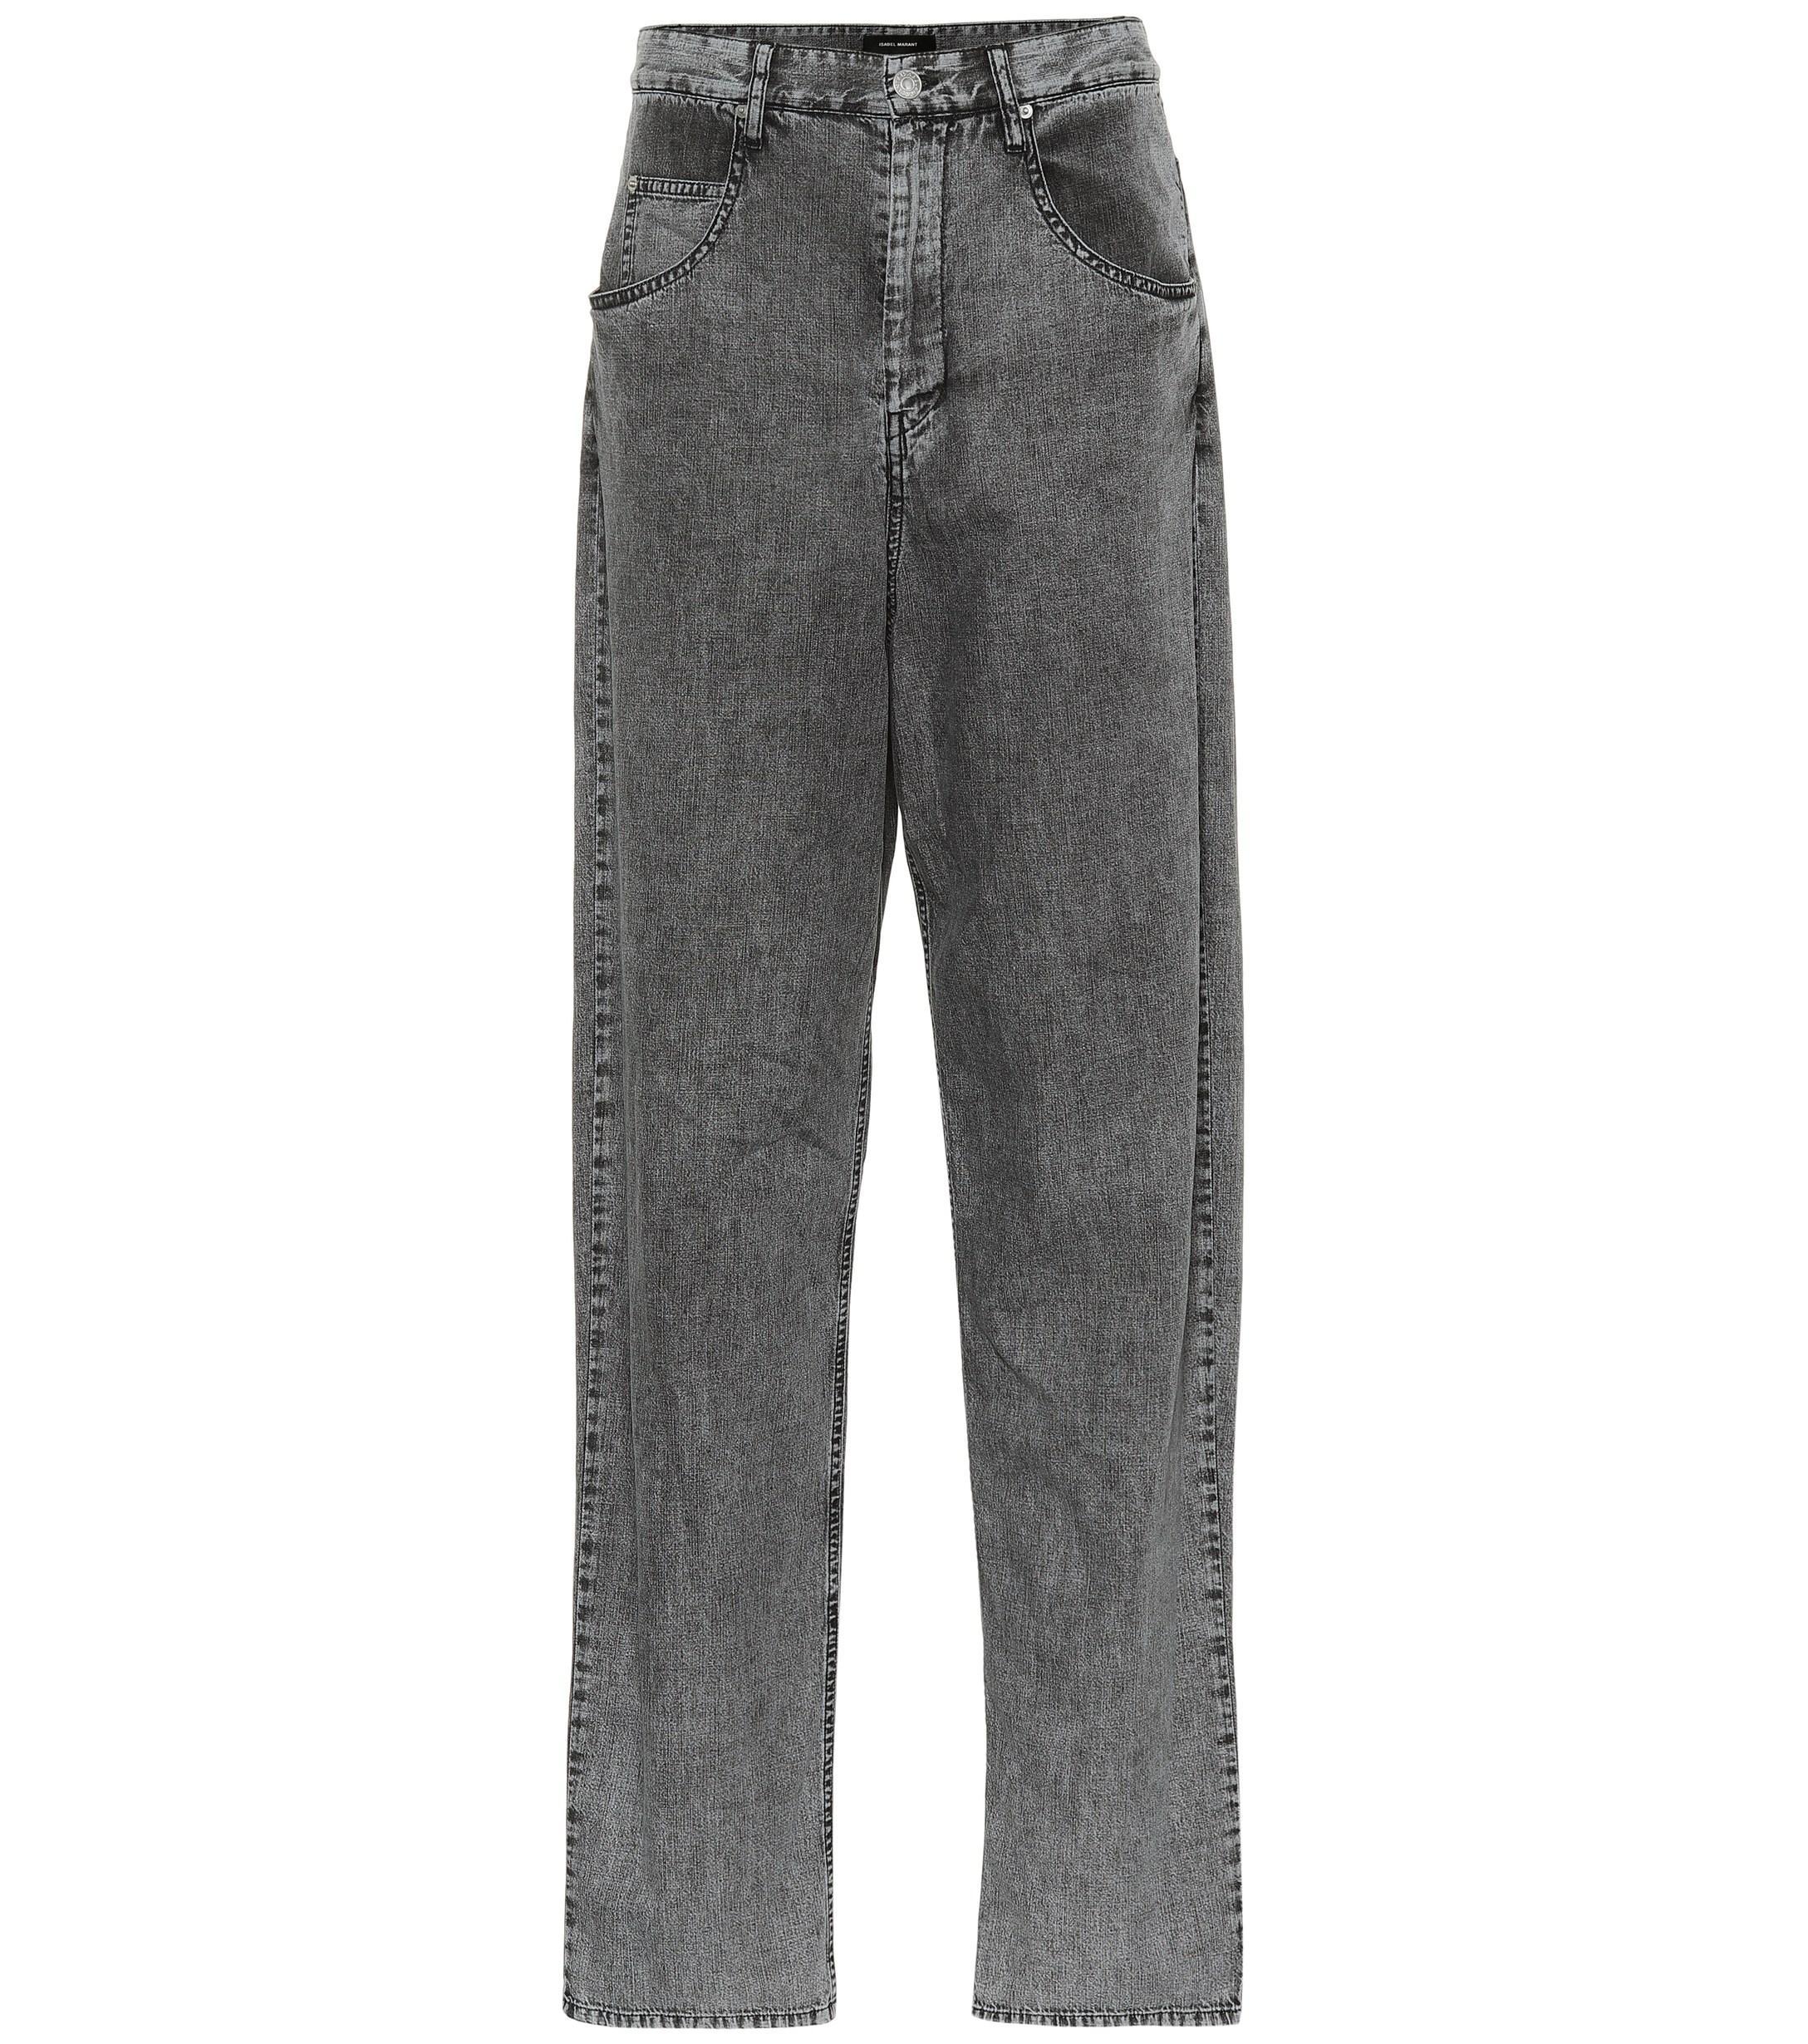 6ce57b9b5bb Isabel Marant Lex High-rise Boyfriend Jeans in Gray - Lyst